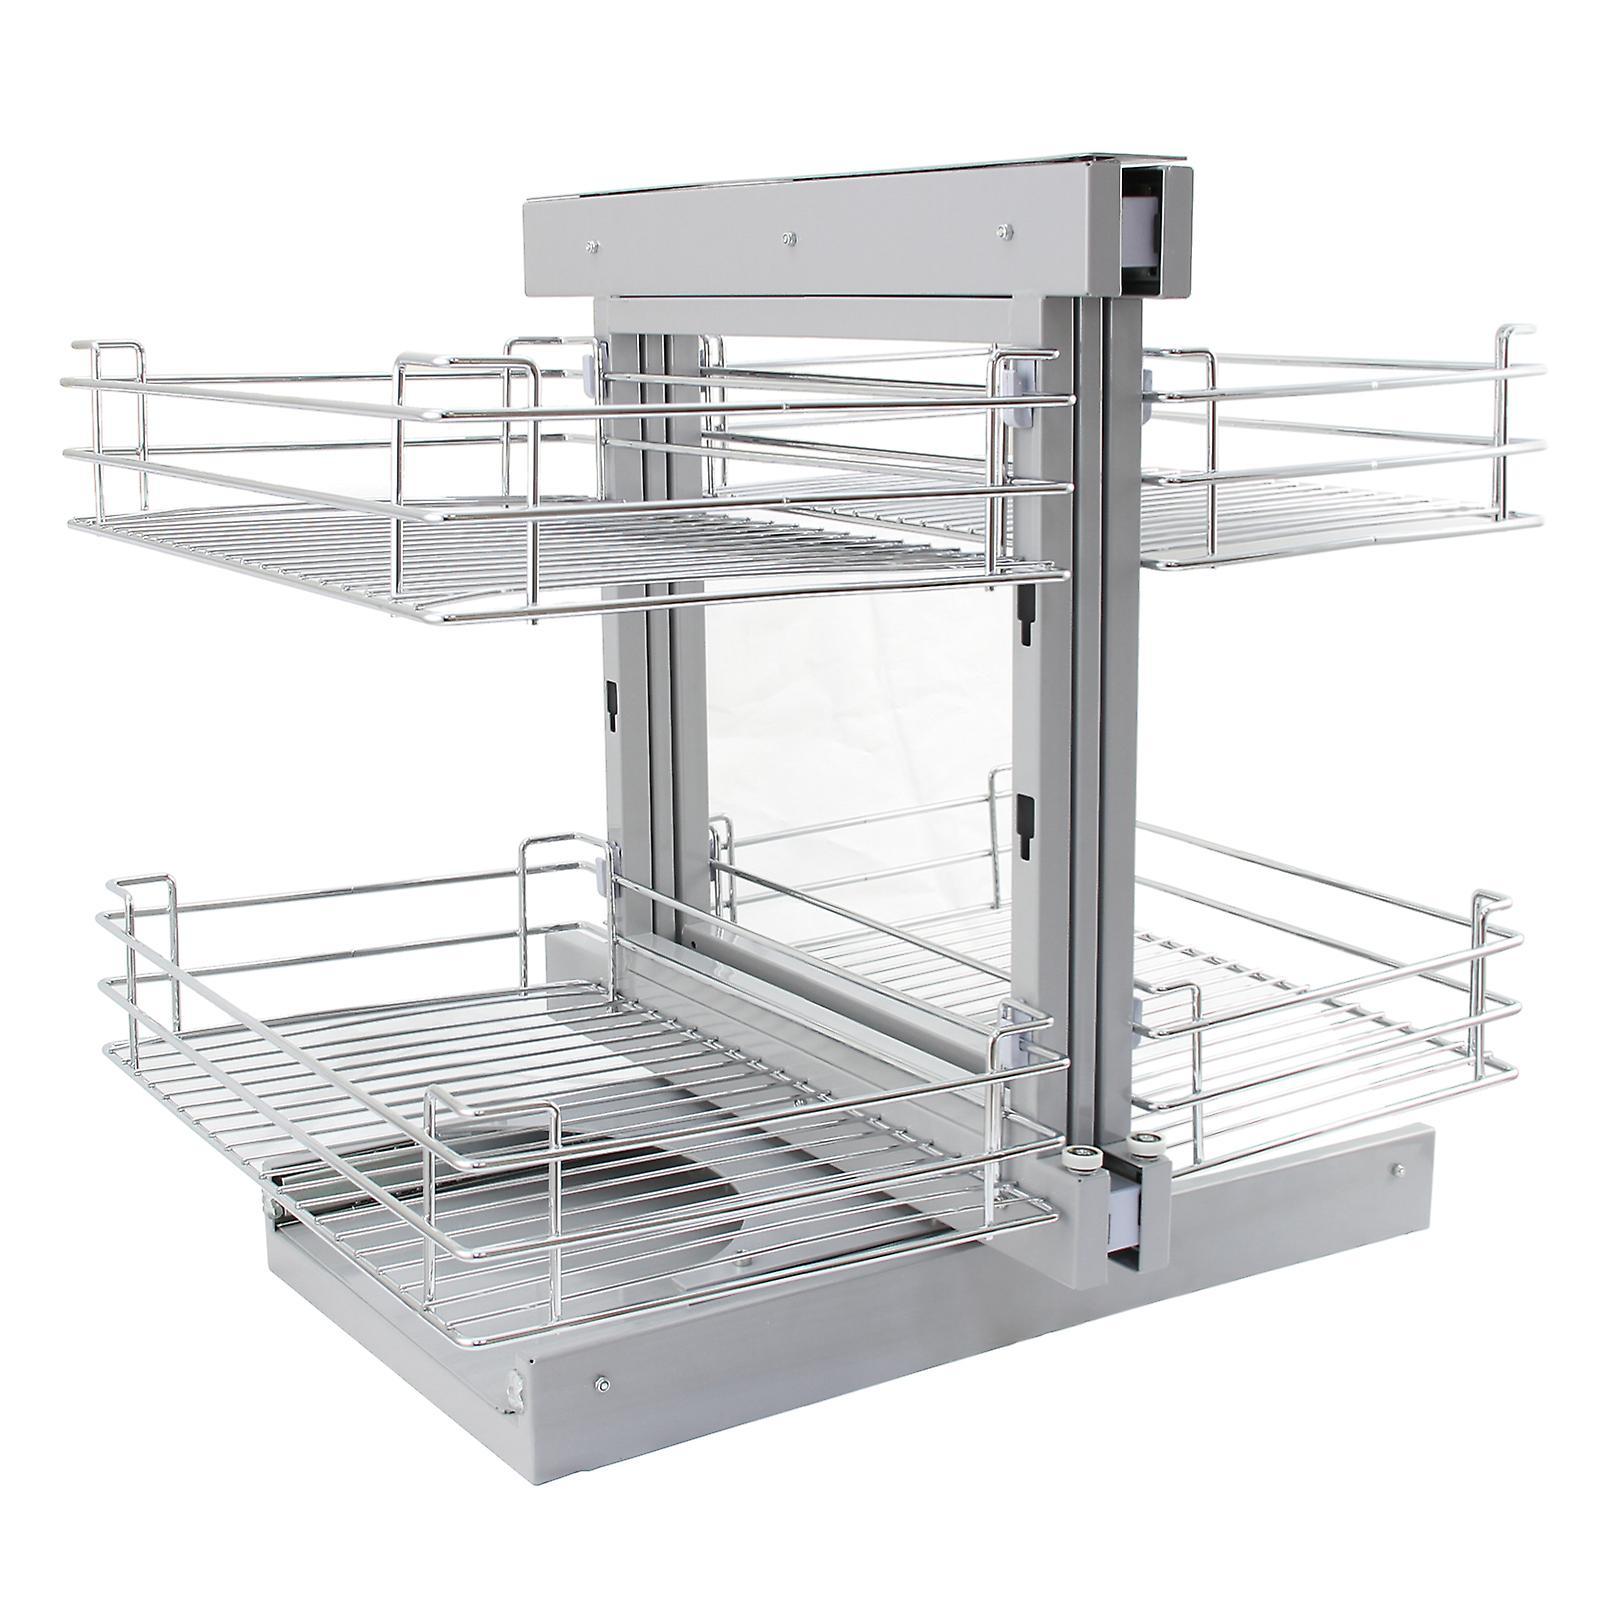 KuKoo Magic Corner herausziehen Küche Schrank Schubladen - links/rechts